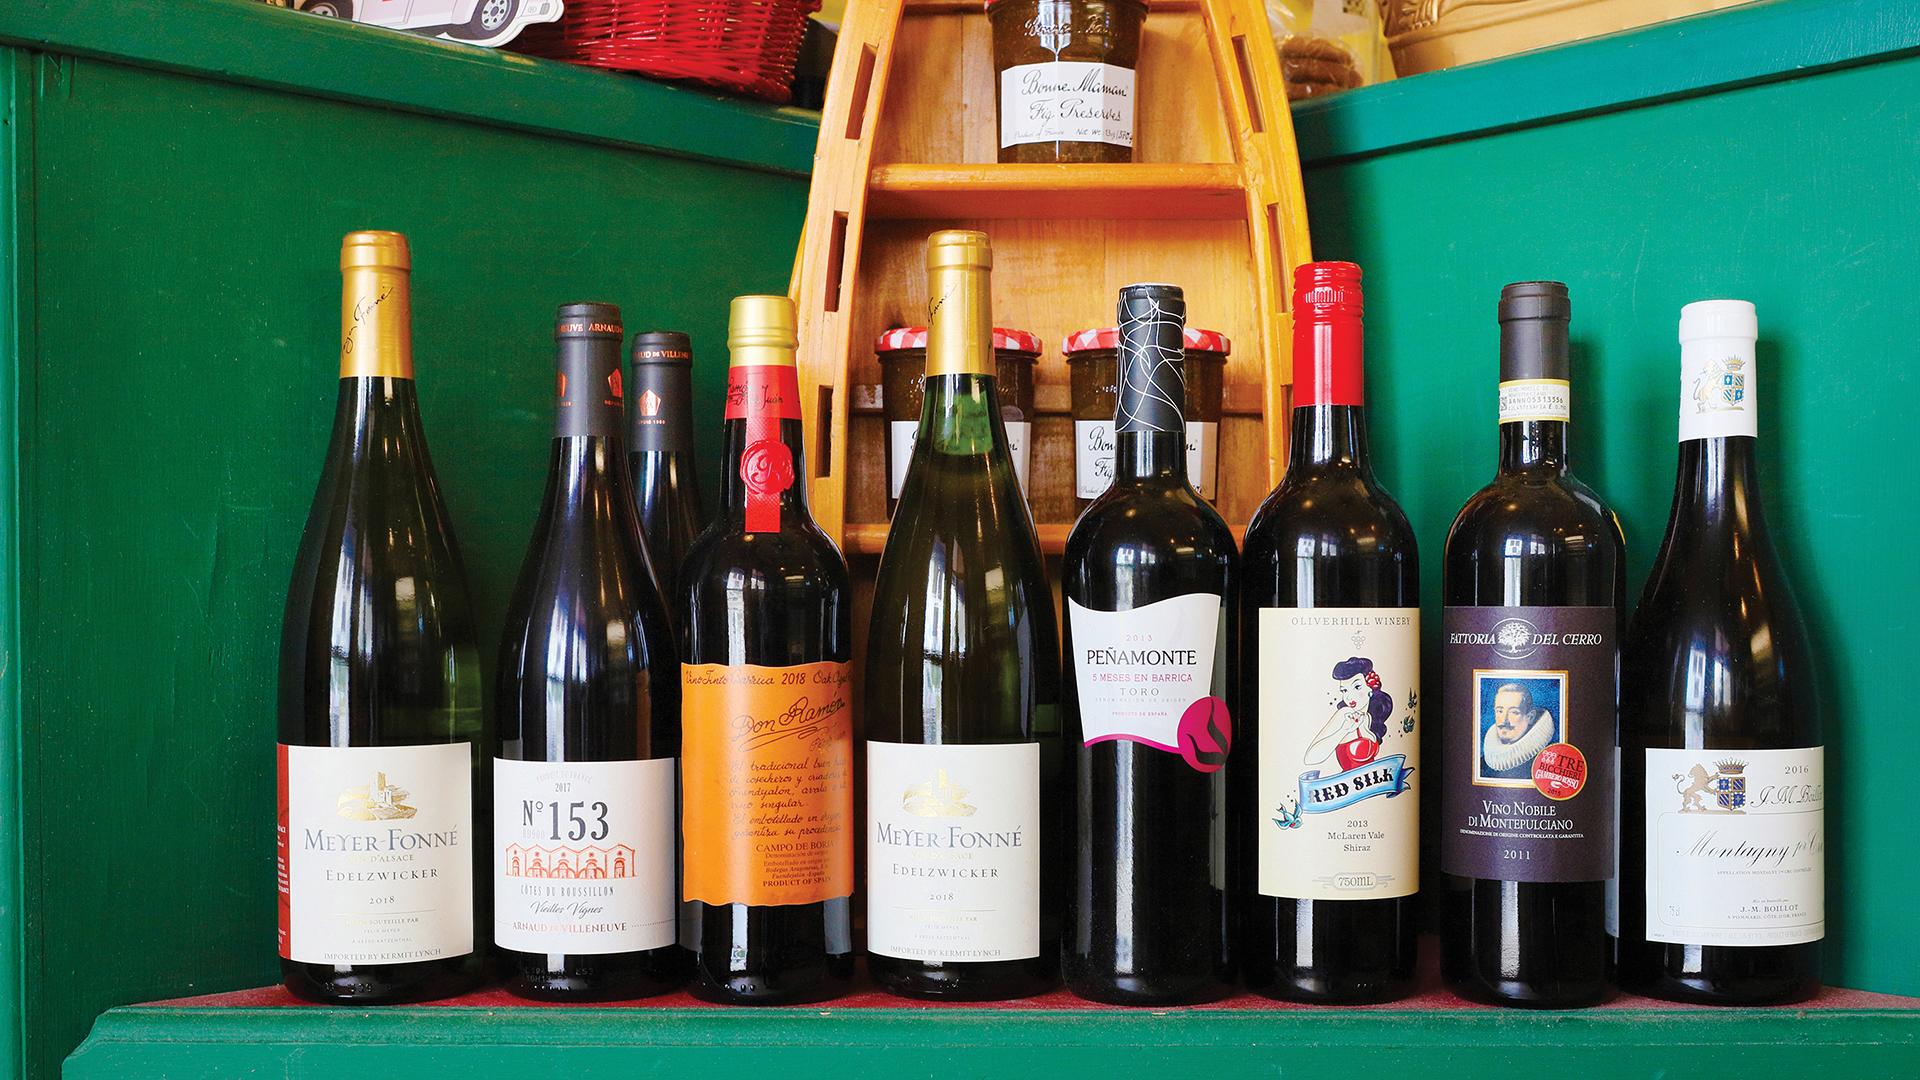 highlands-nc-shopping-rosewood-wine